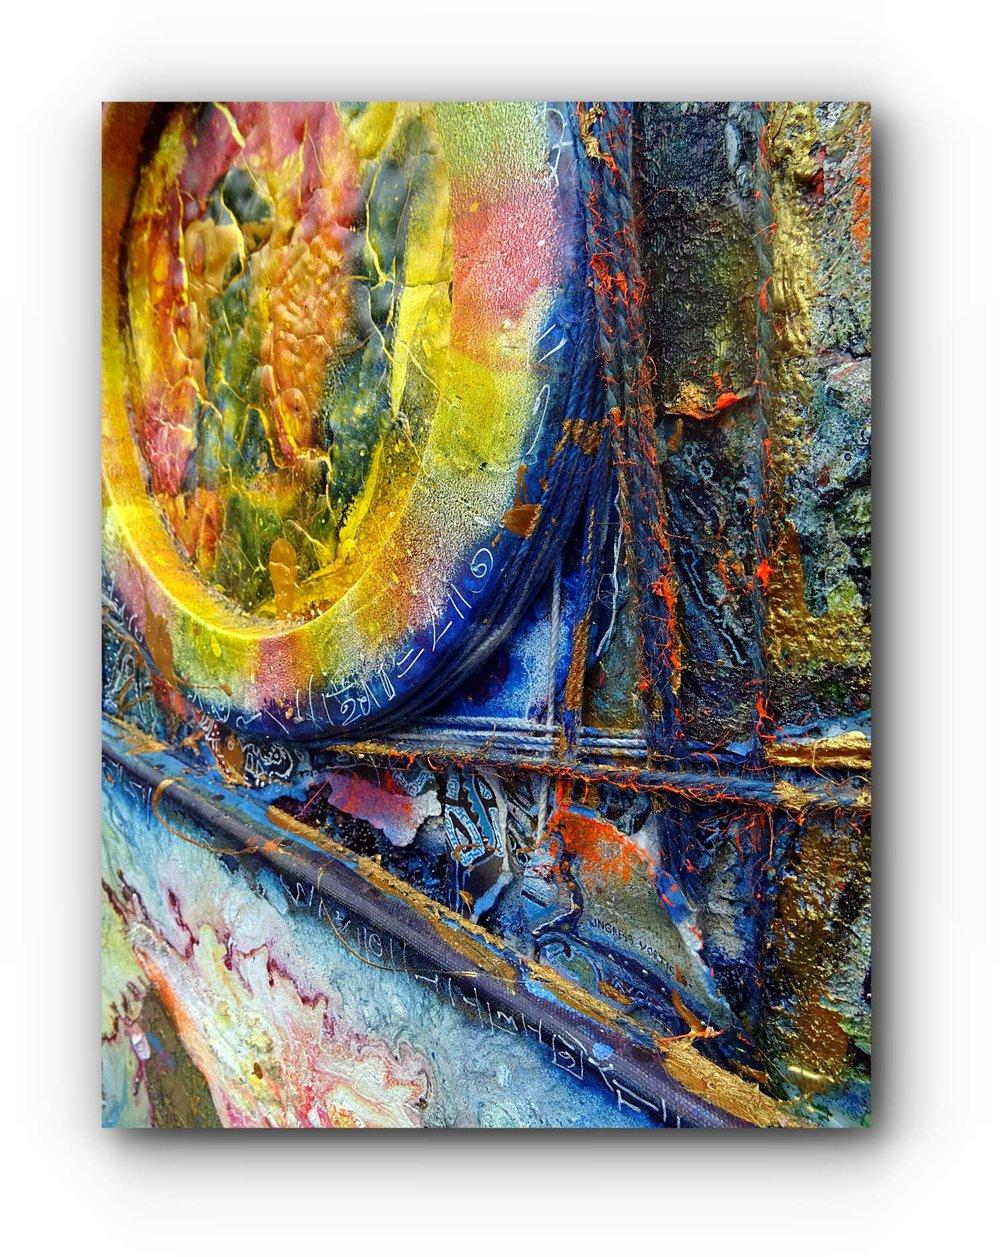 painting-detail-2-portal-artist-duo-ingress-vortices.jpg